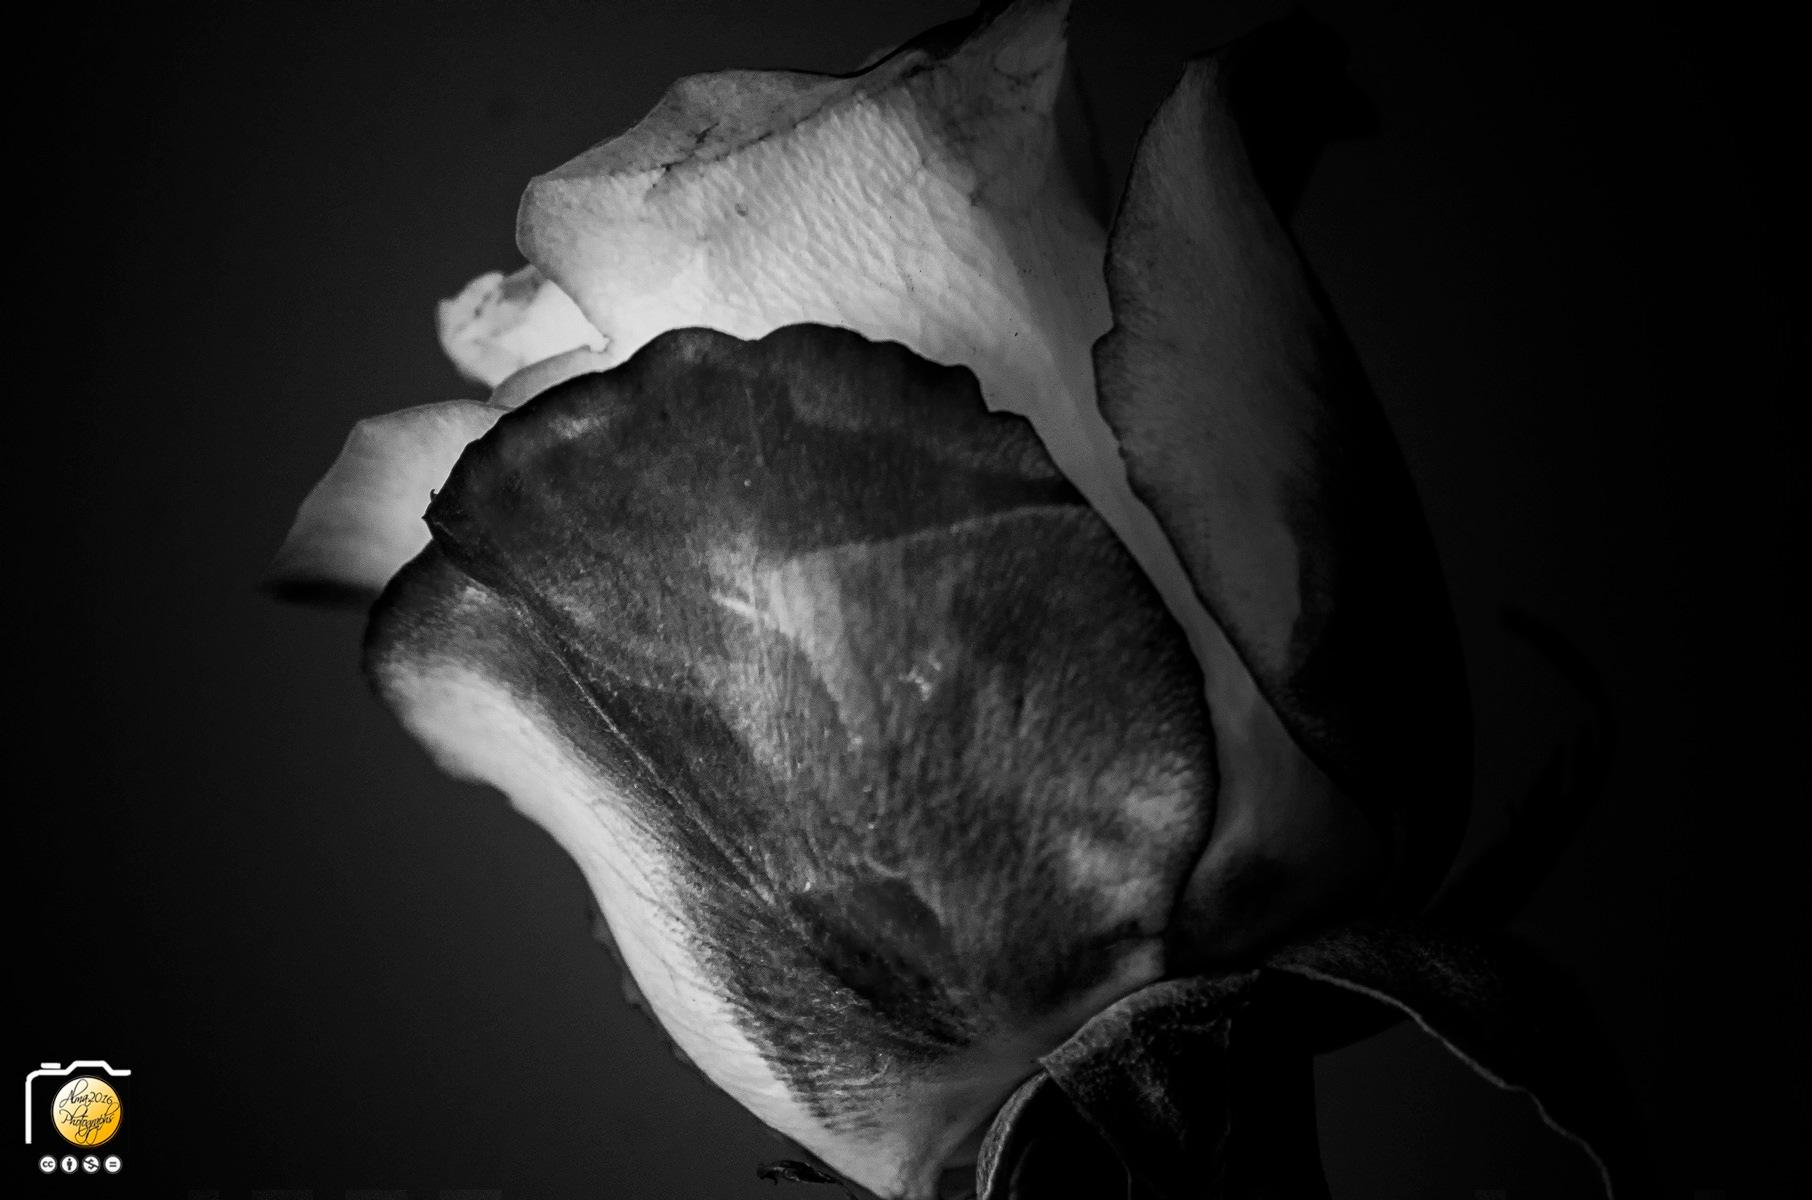 BnW Rose by Alberto Márquez Marín